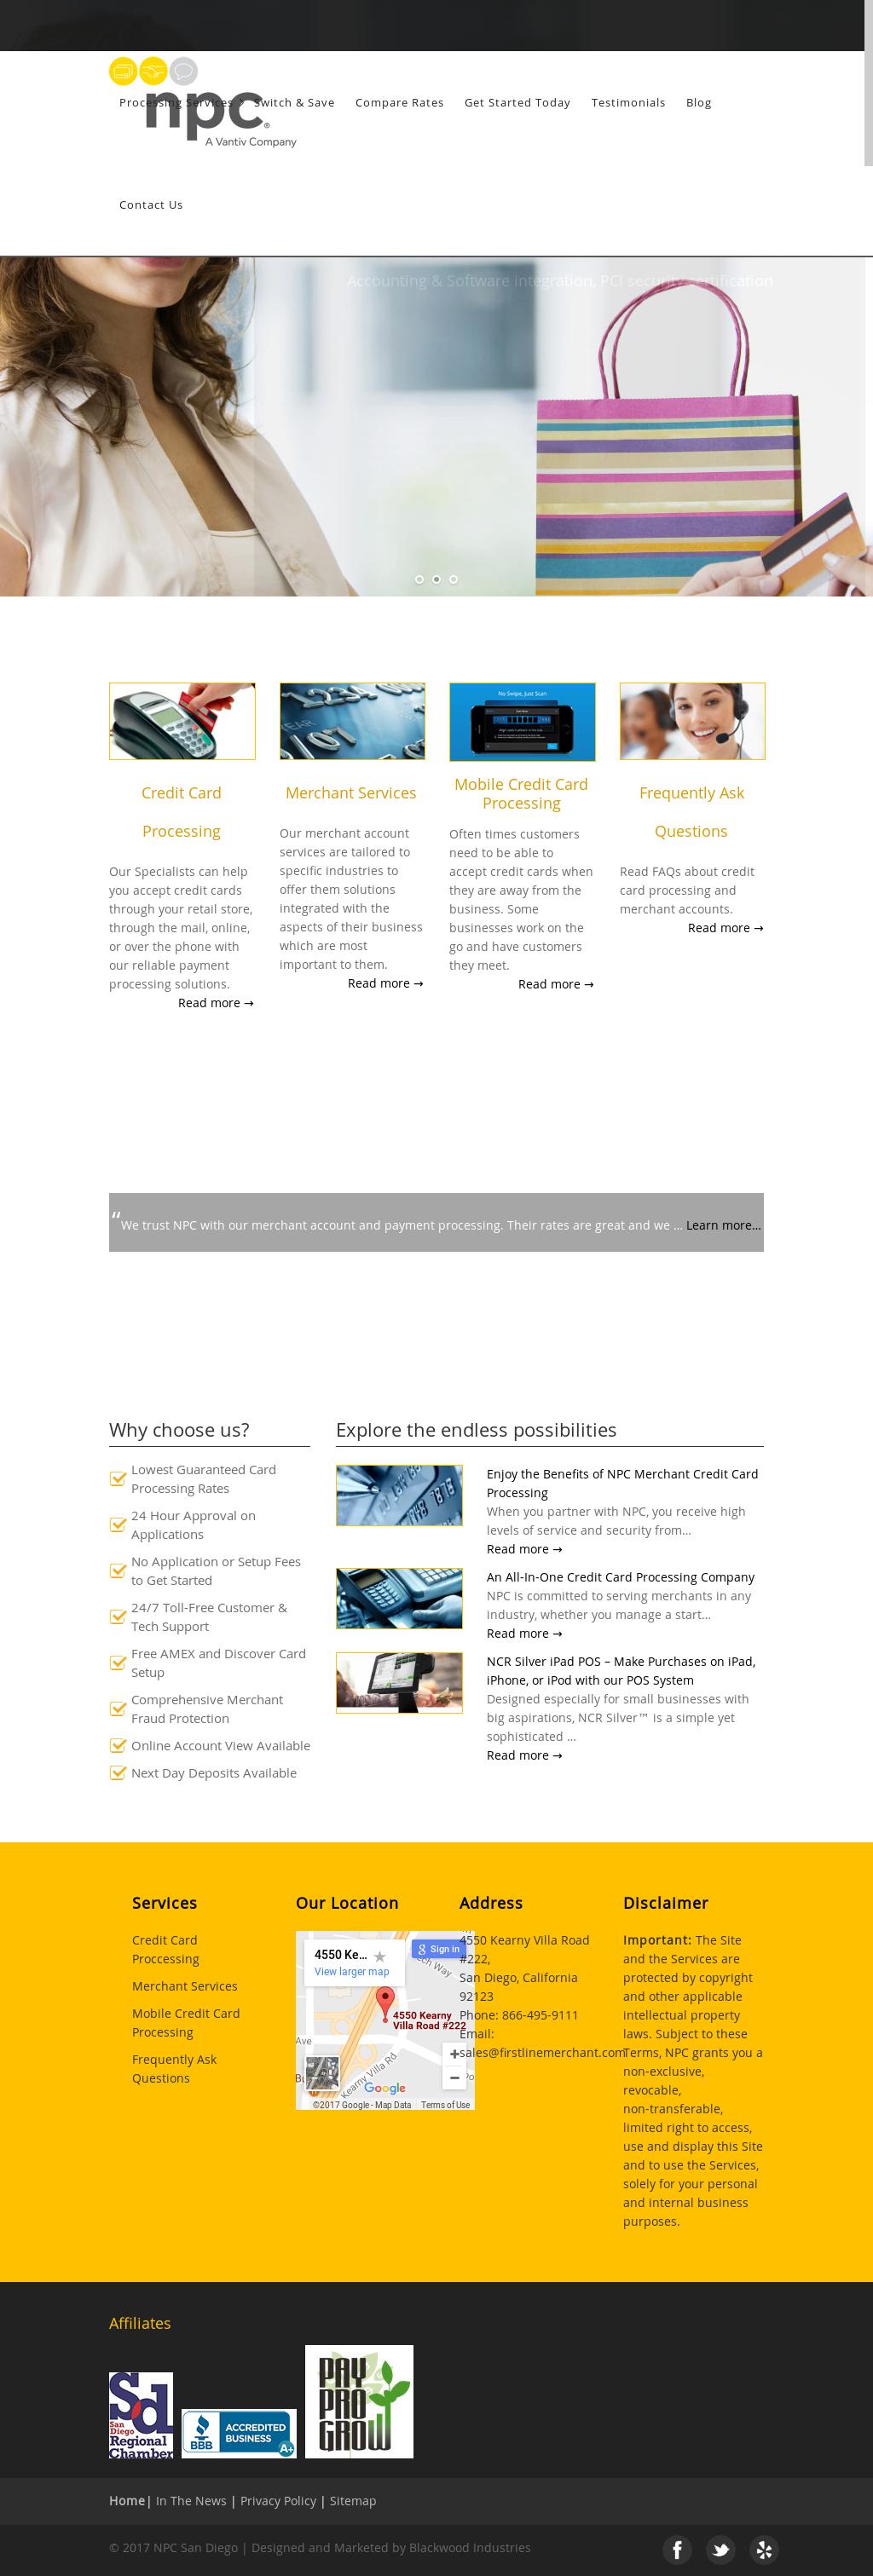 Creditcardprocessingsandiego Competitors, Revenue and